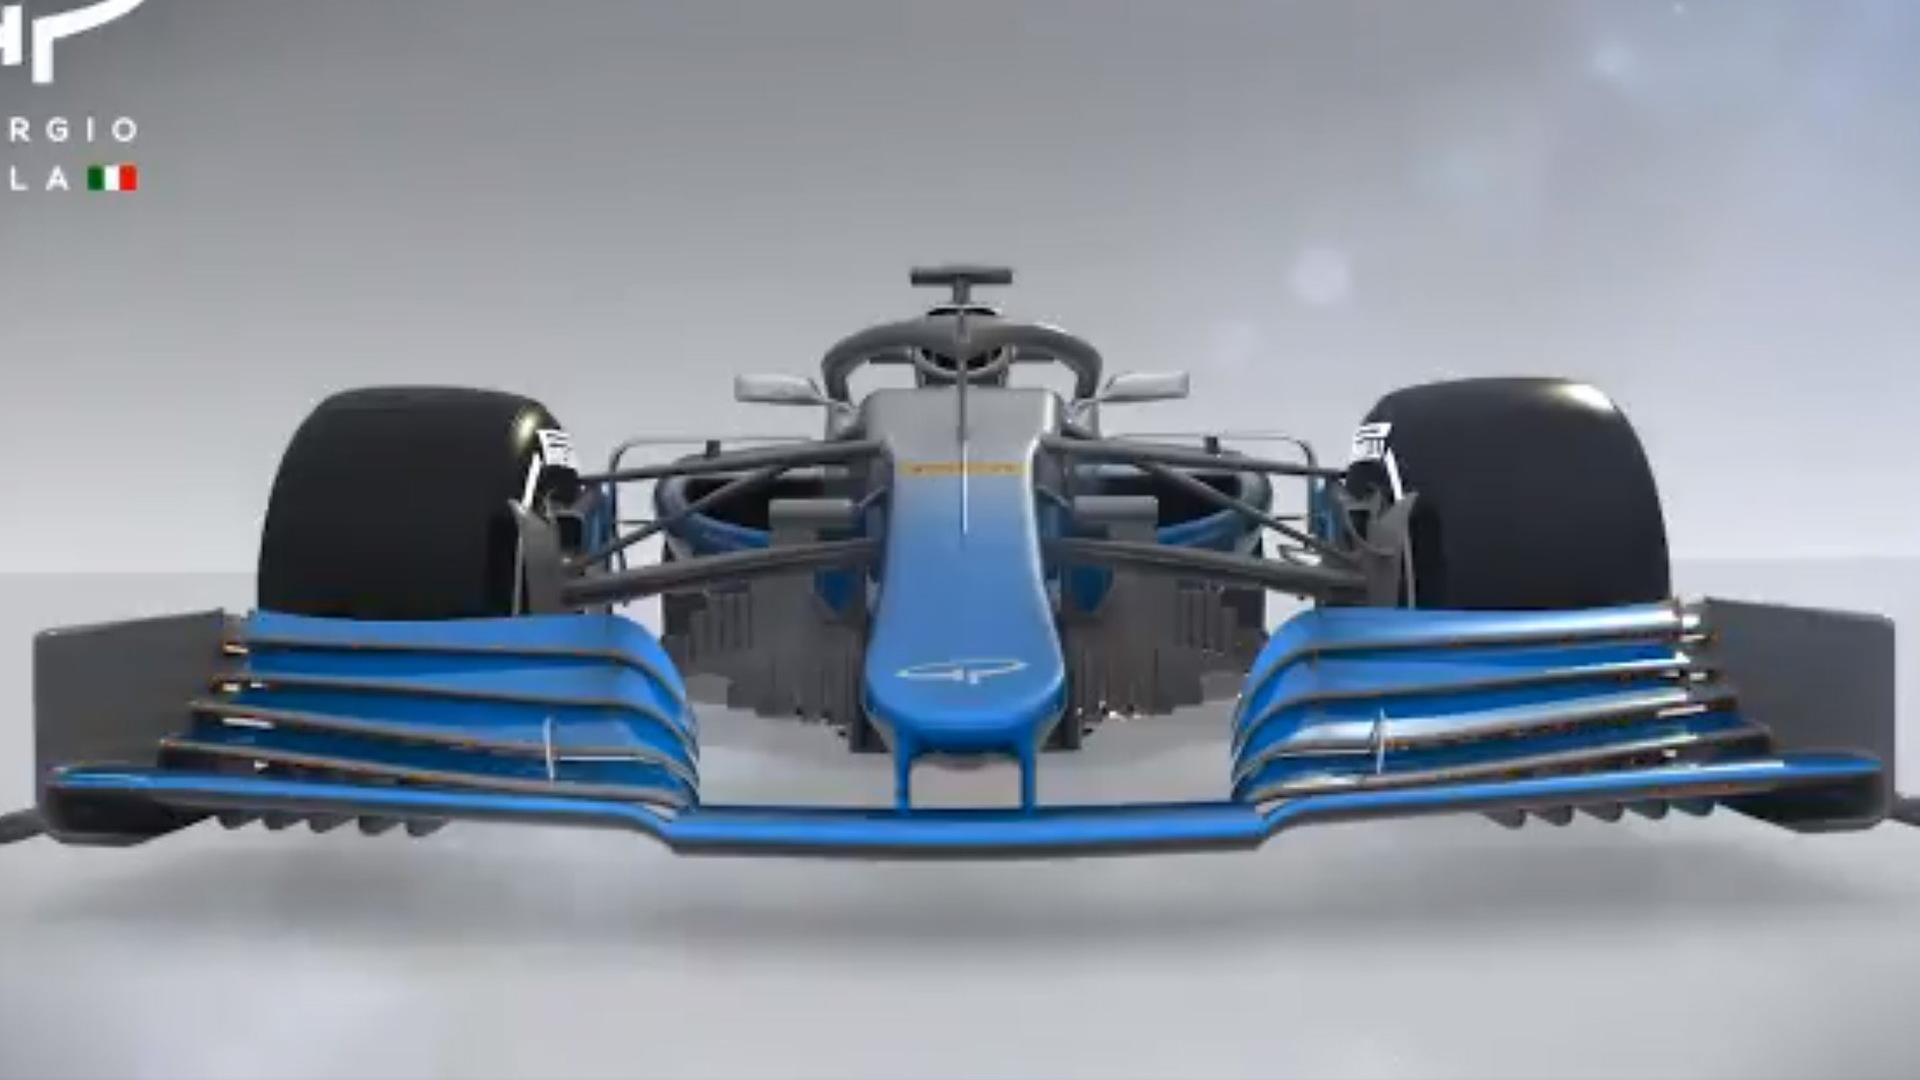 2019 Formula 1 car design